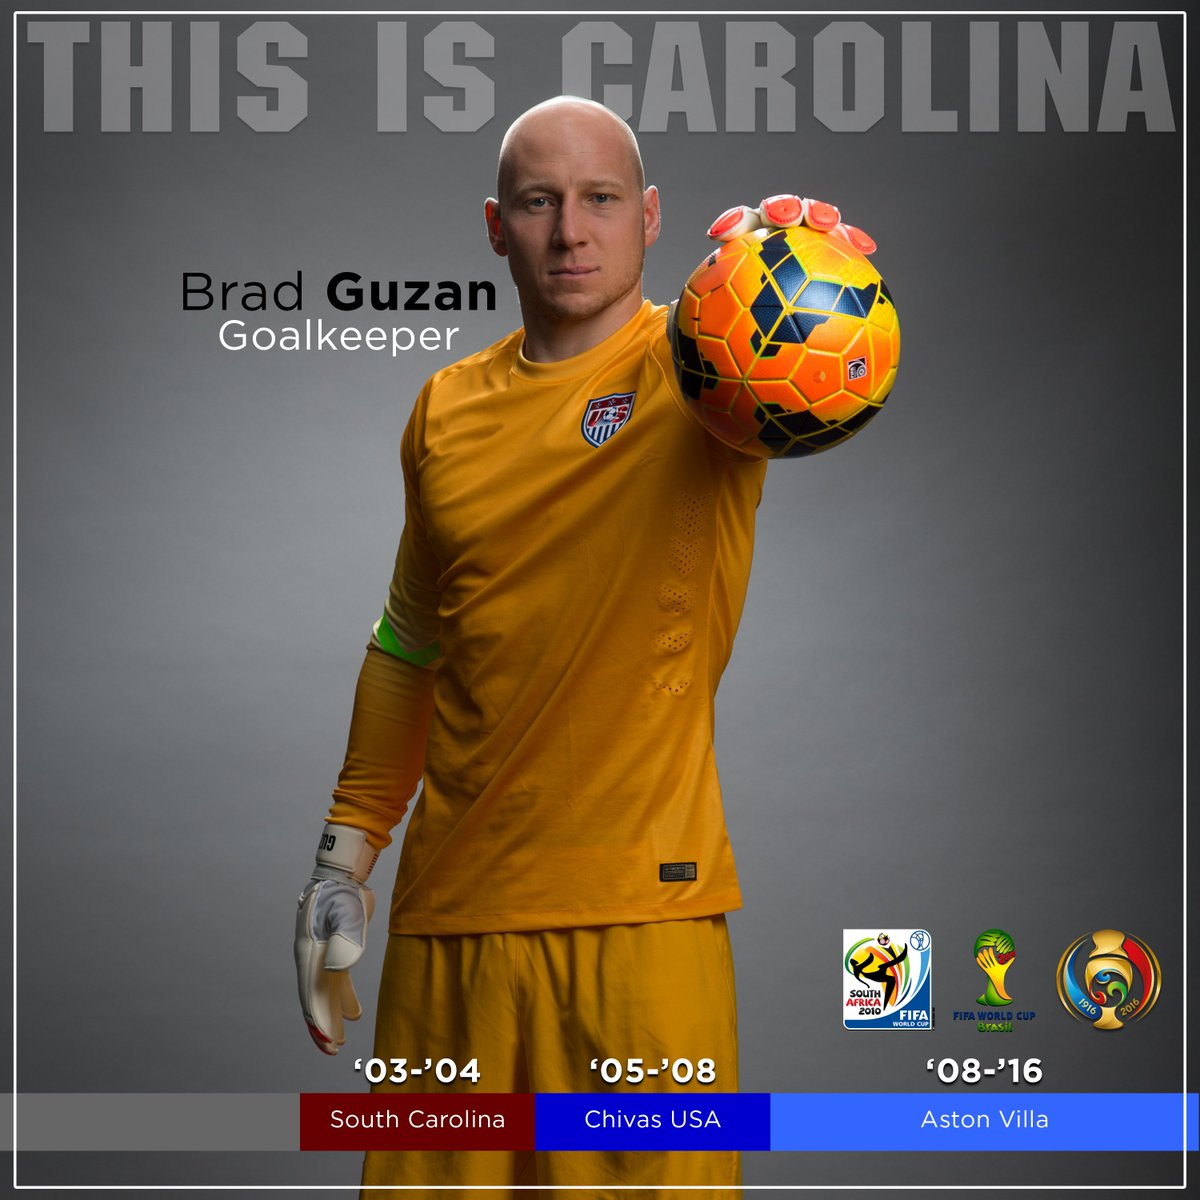 Good luck to former #Gamecocks GK Brad Guzan who starts in goal tonight for the US National Team https://t.co/UWlMjRmCqi